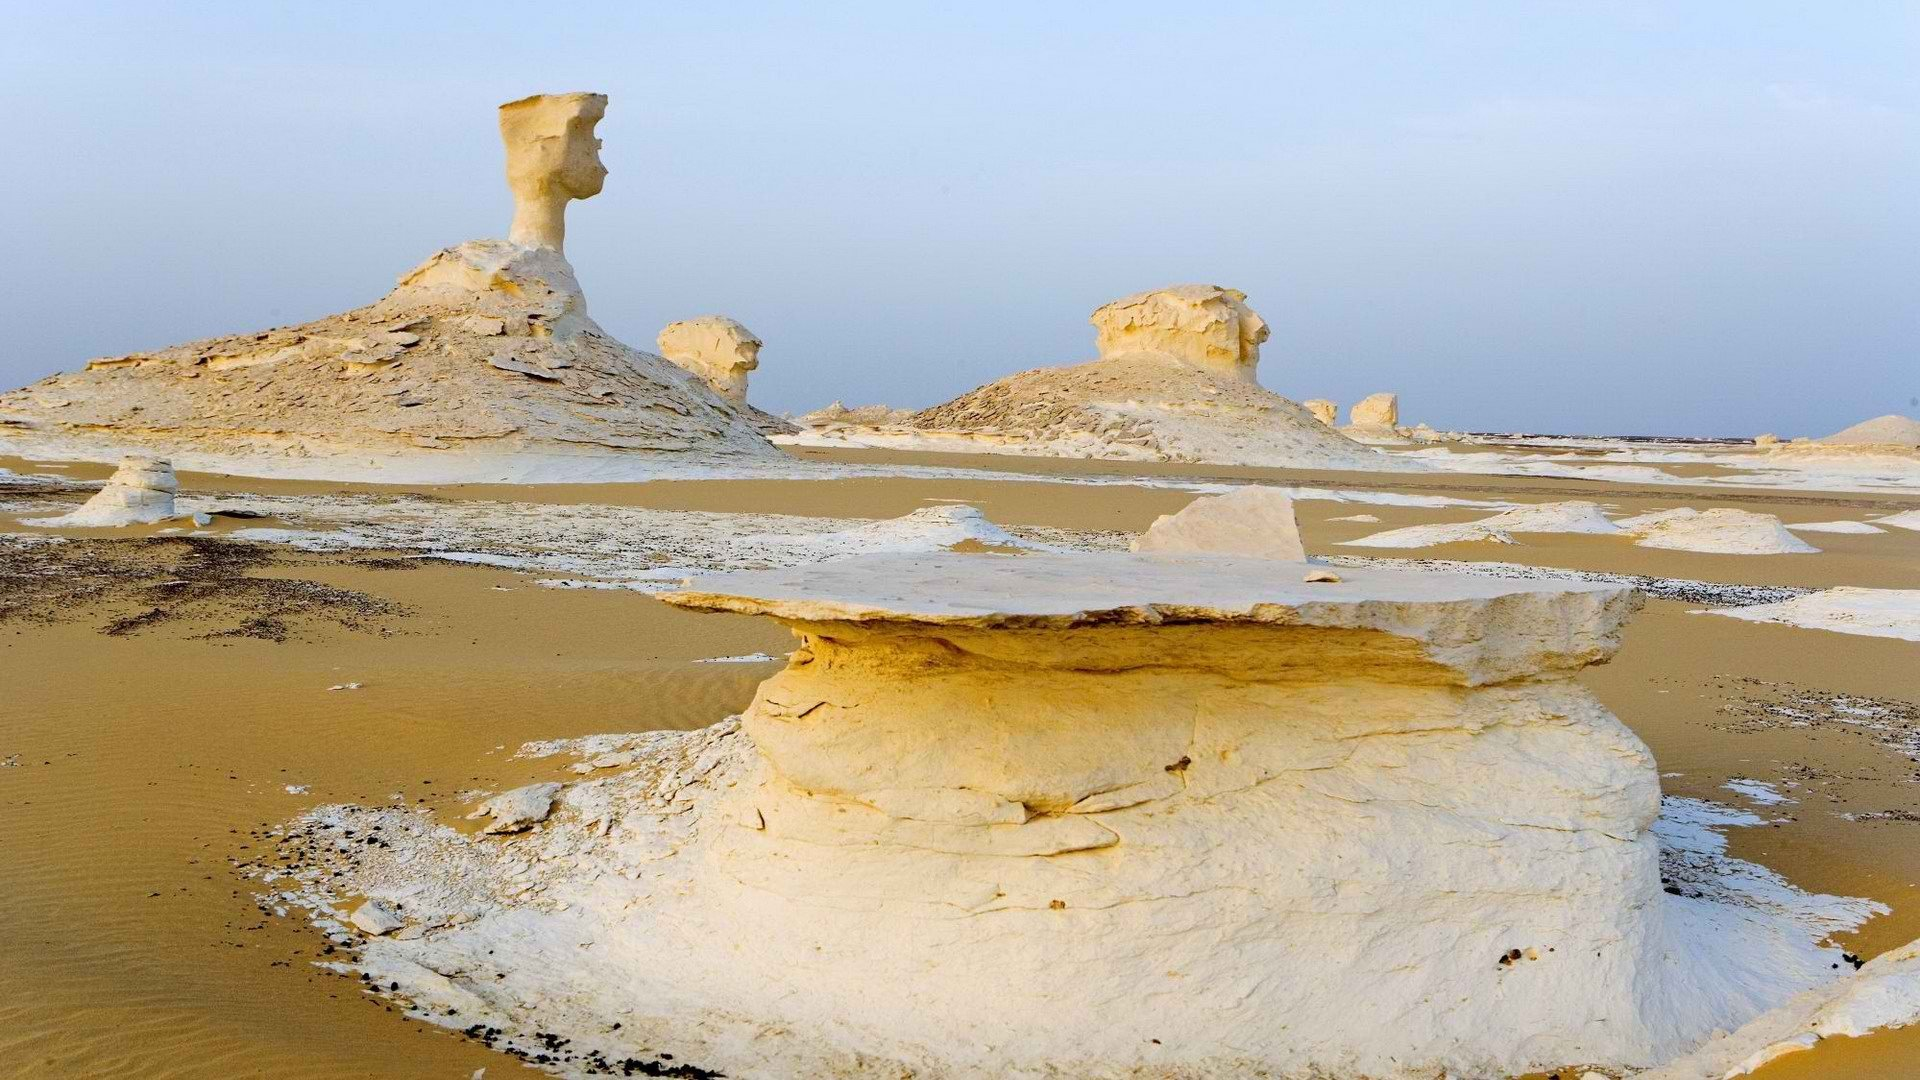 Landscapes white deserts Egypt oasis wallpaper 1920x1080 296163 1920x1080